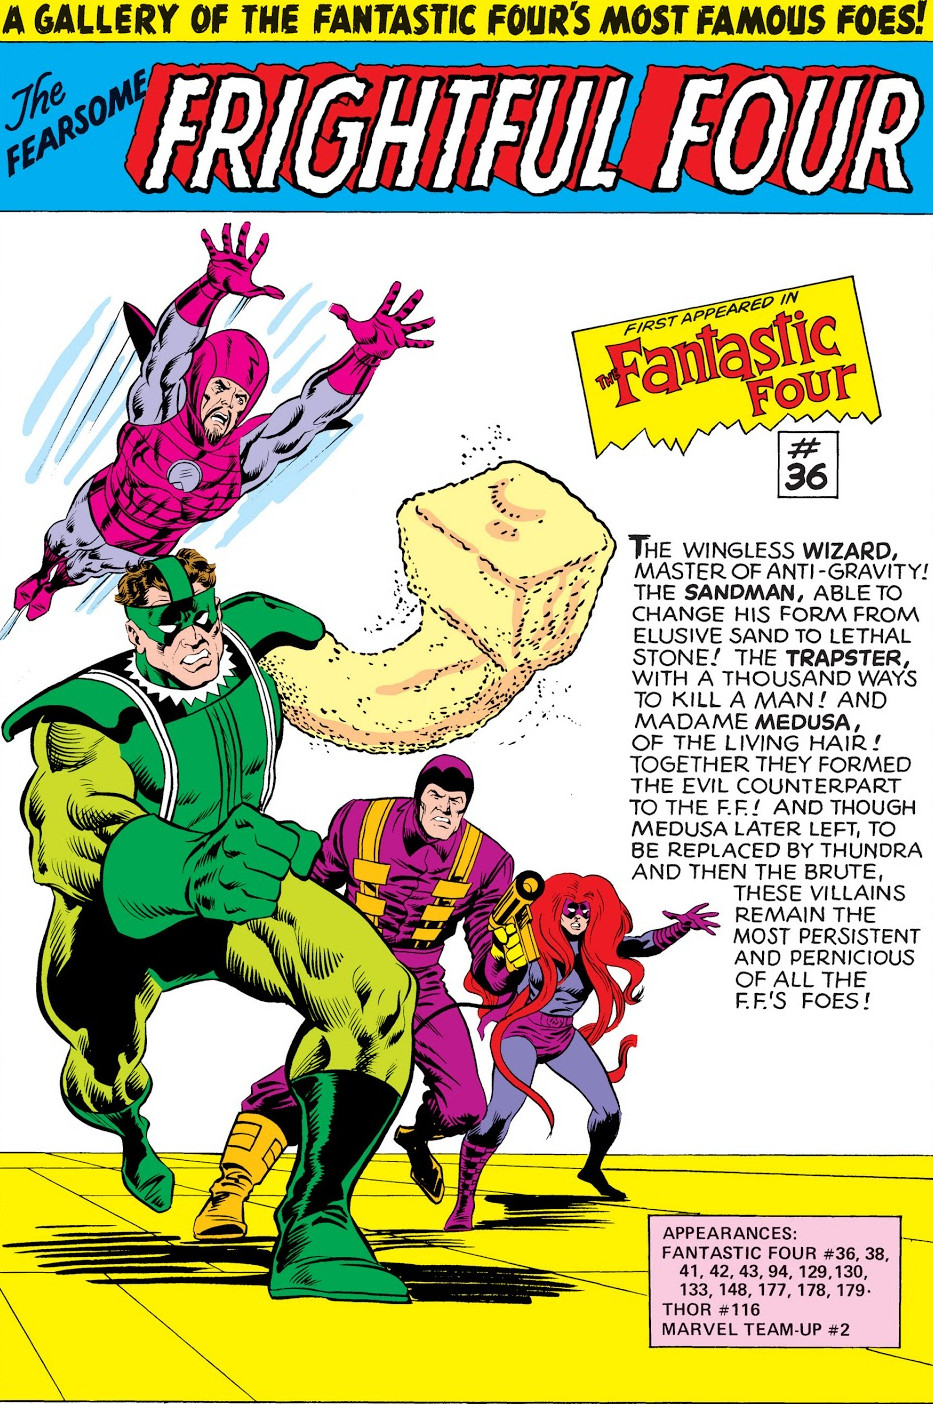 Frightful Four (Earth-616) from Fantastic Four Annual Vol 1 14 0001.jpg